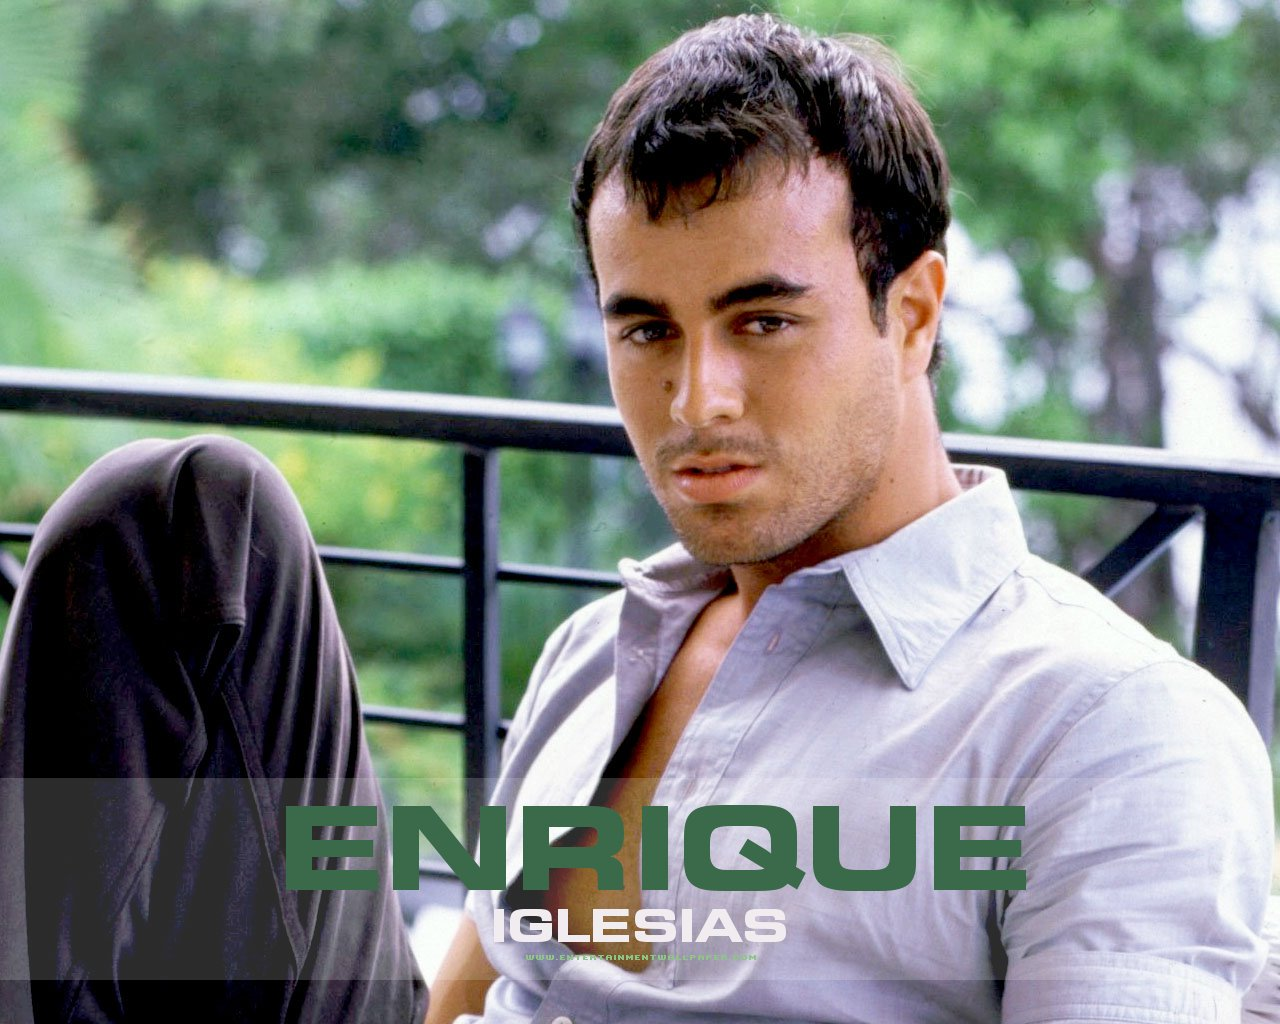 http://2.bp.blogspot.com/-pW2PibkJ5Gw/TcrRvXloCHI/AAAAAAAAAkg/hnrSgyAzsOs/s1600/Enrique-Iglesias-Hot-Wallpapers-3.jpg